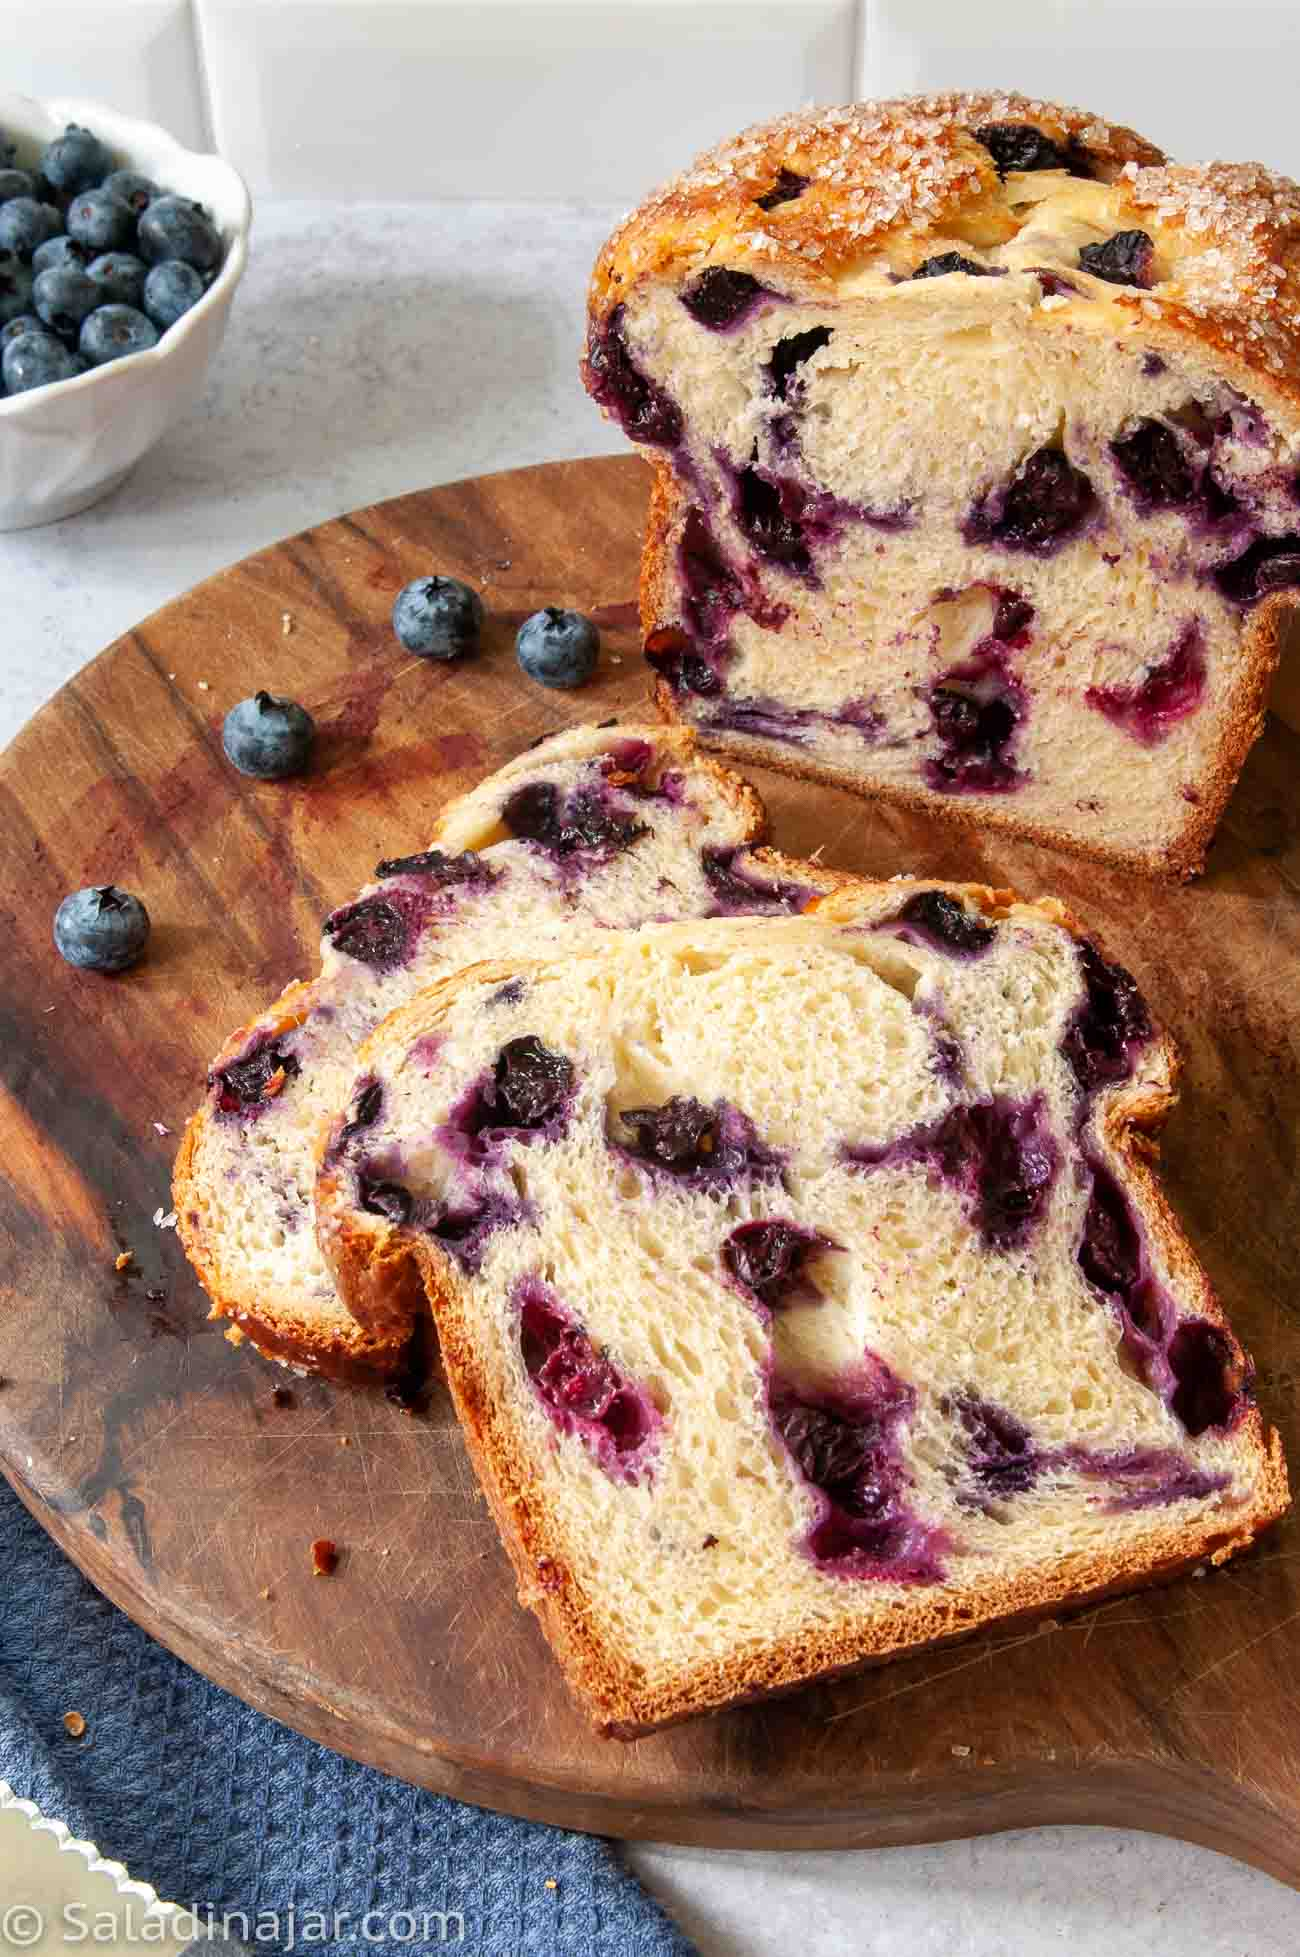 sliced sweet bread machine blueberry bread on a cutting board